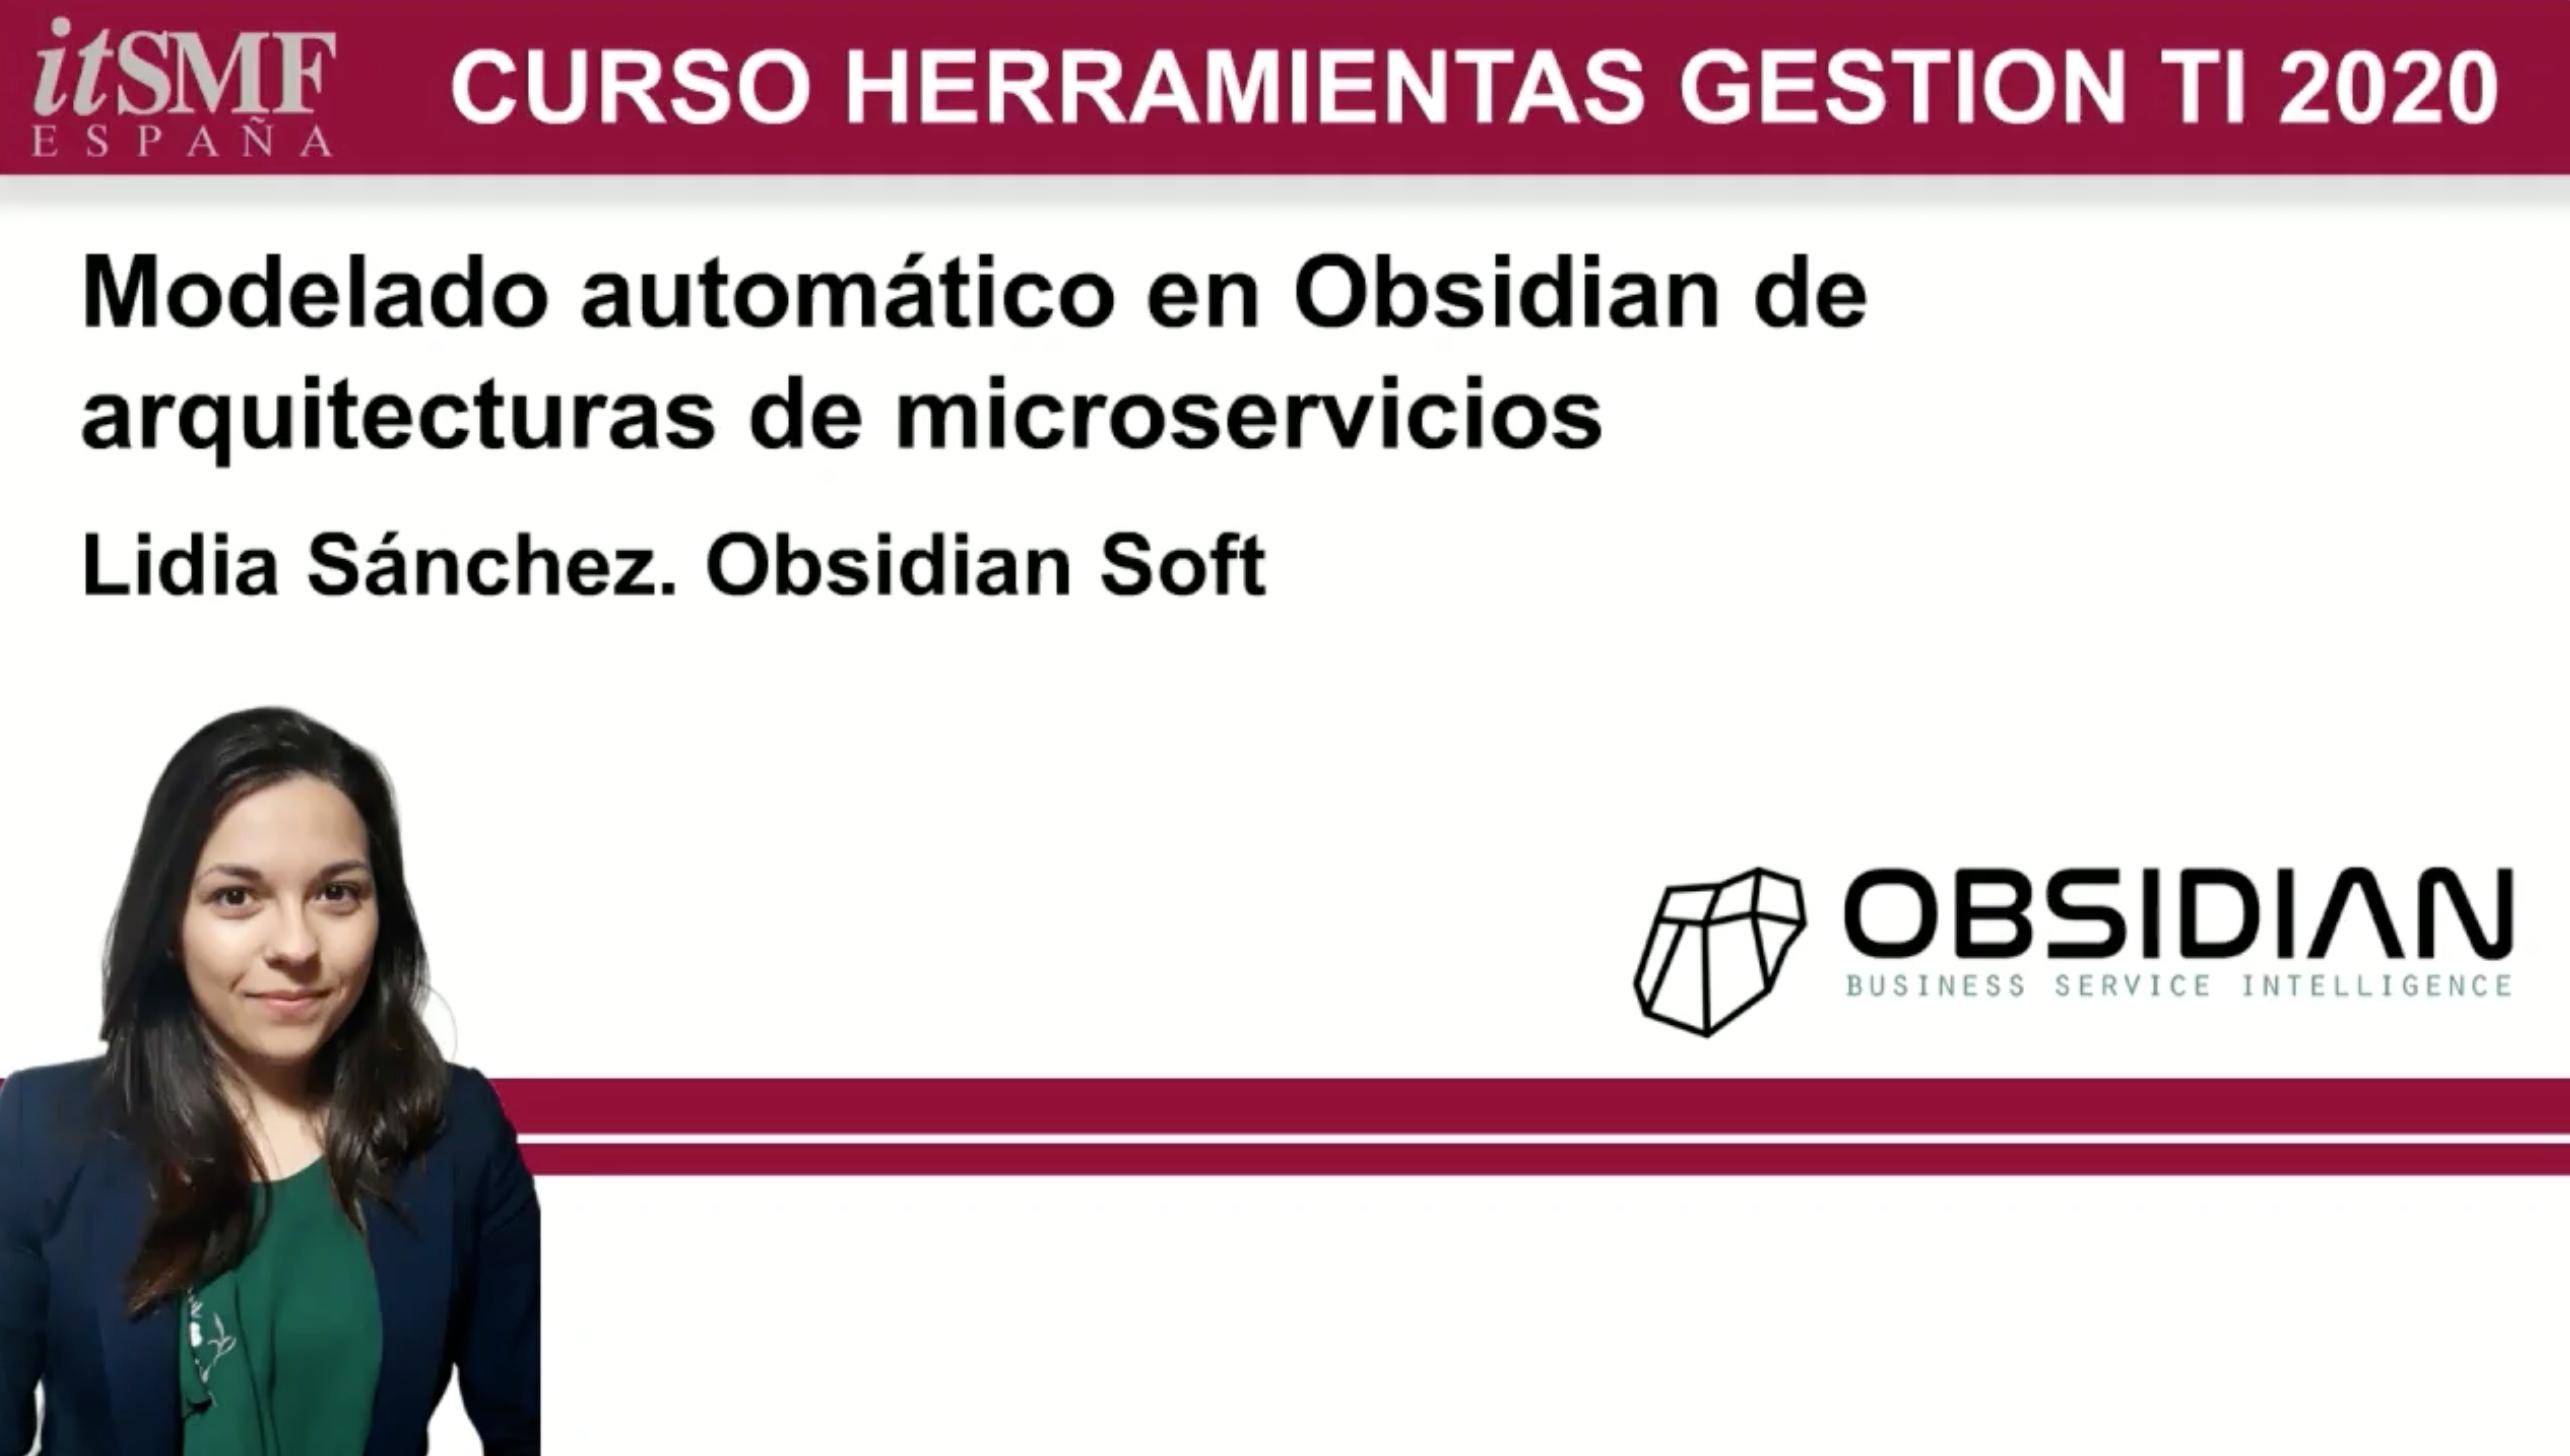 Modelado automático de arquitecturas de microservicios en Obsidian